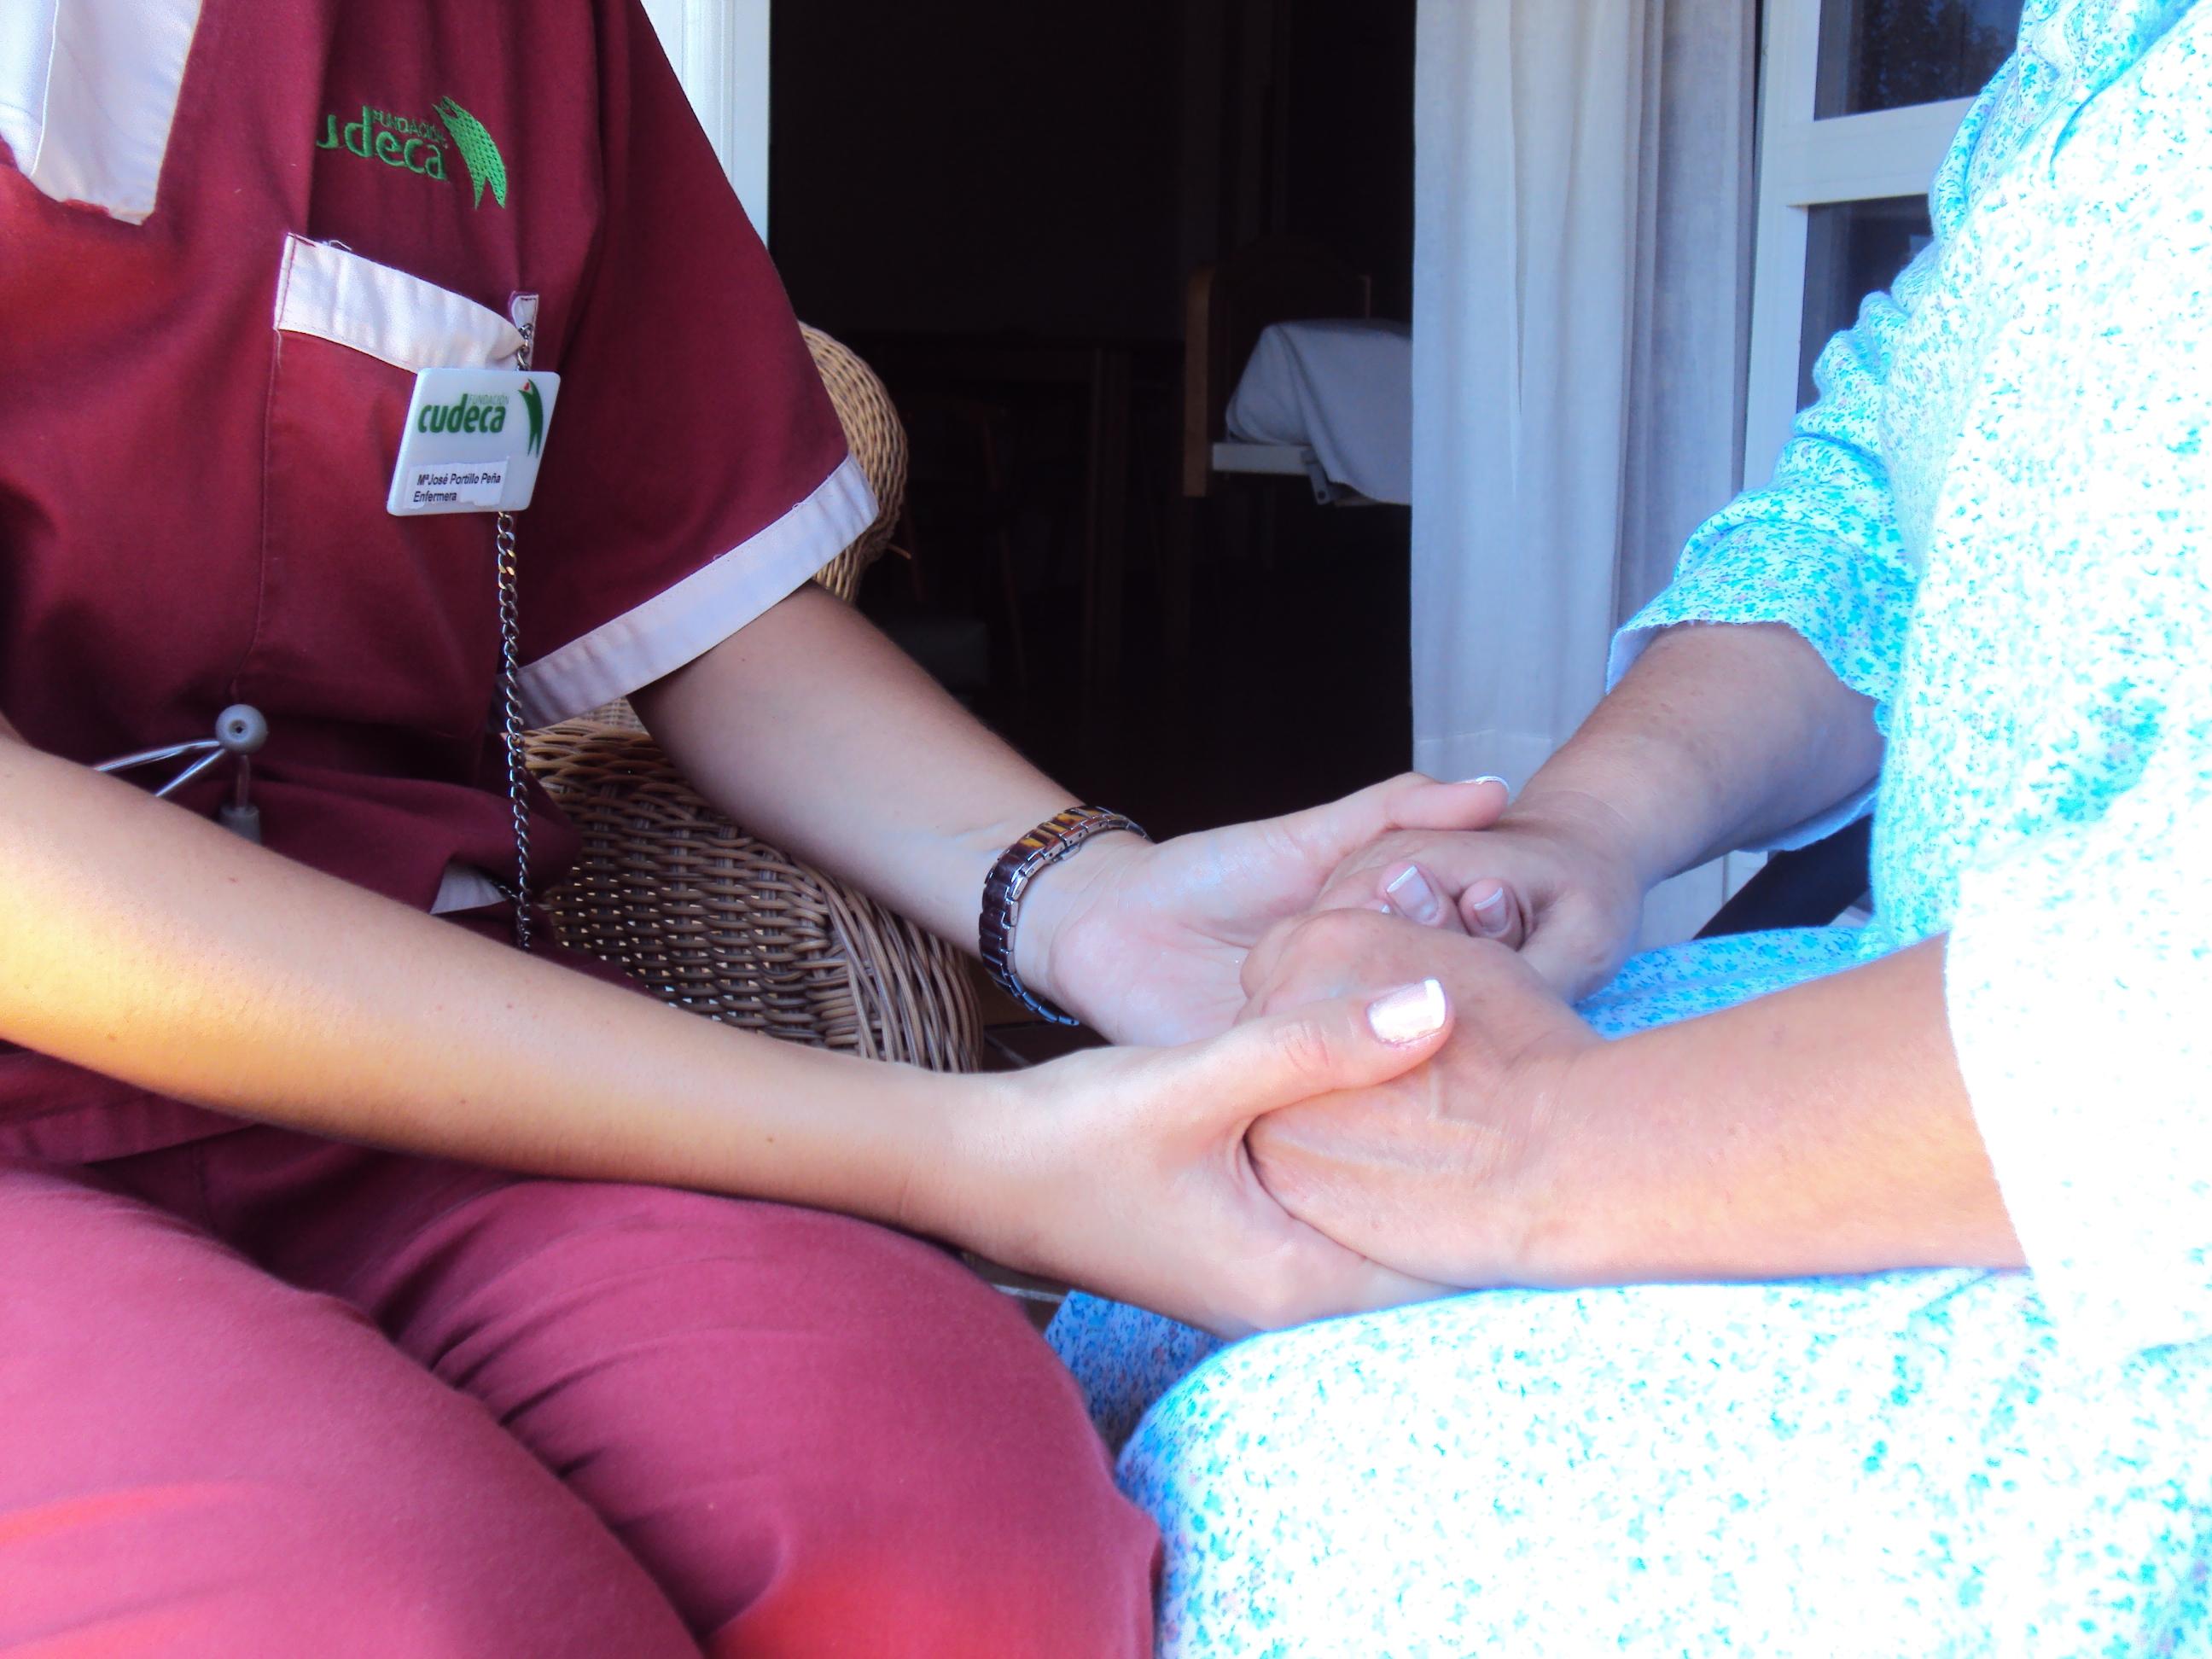 Taller de Actualización en Sedación Paliativa